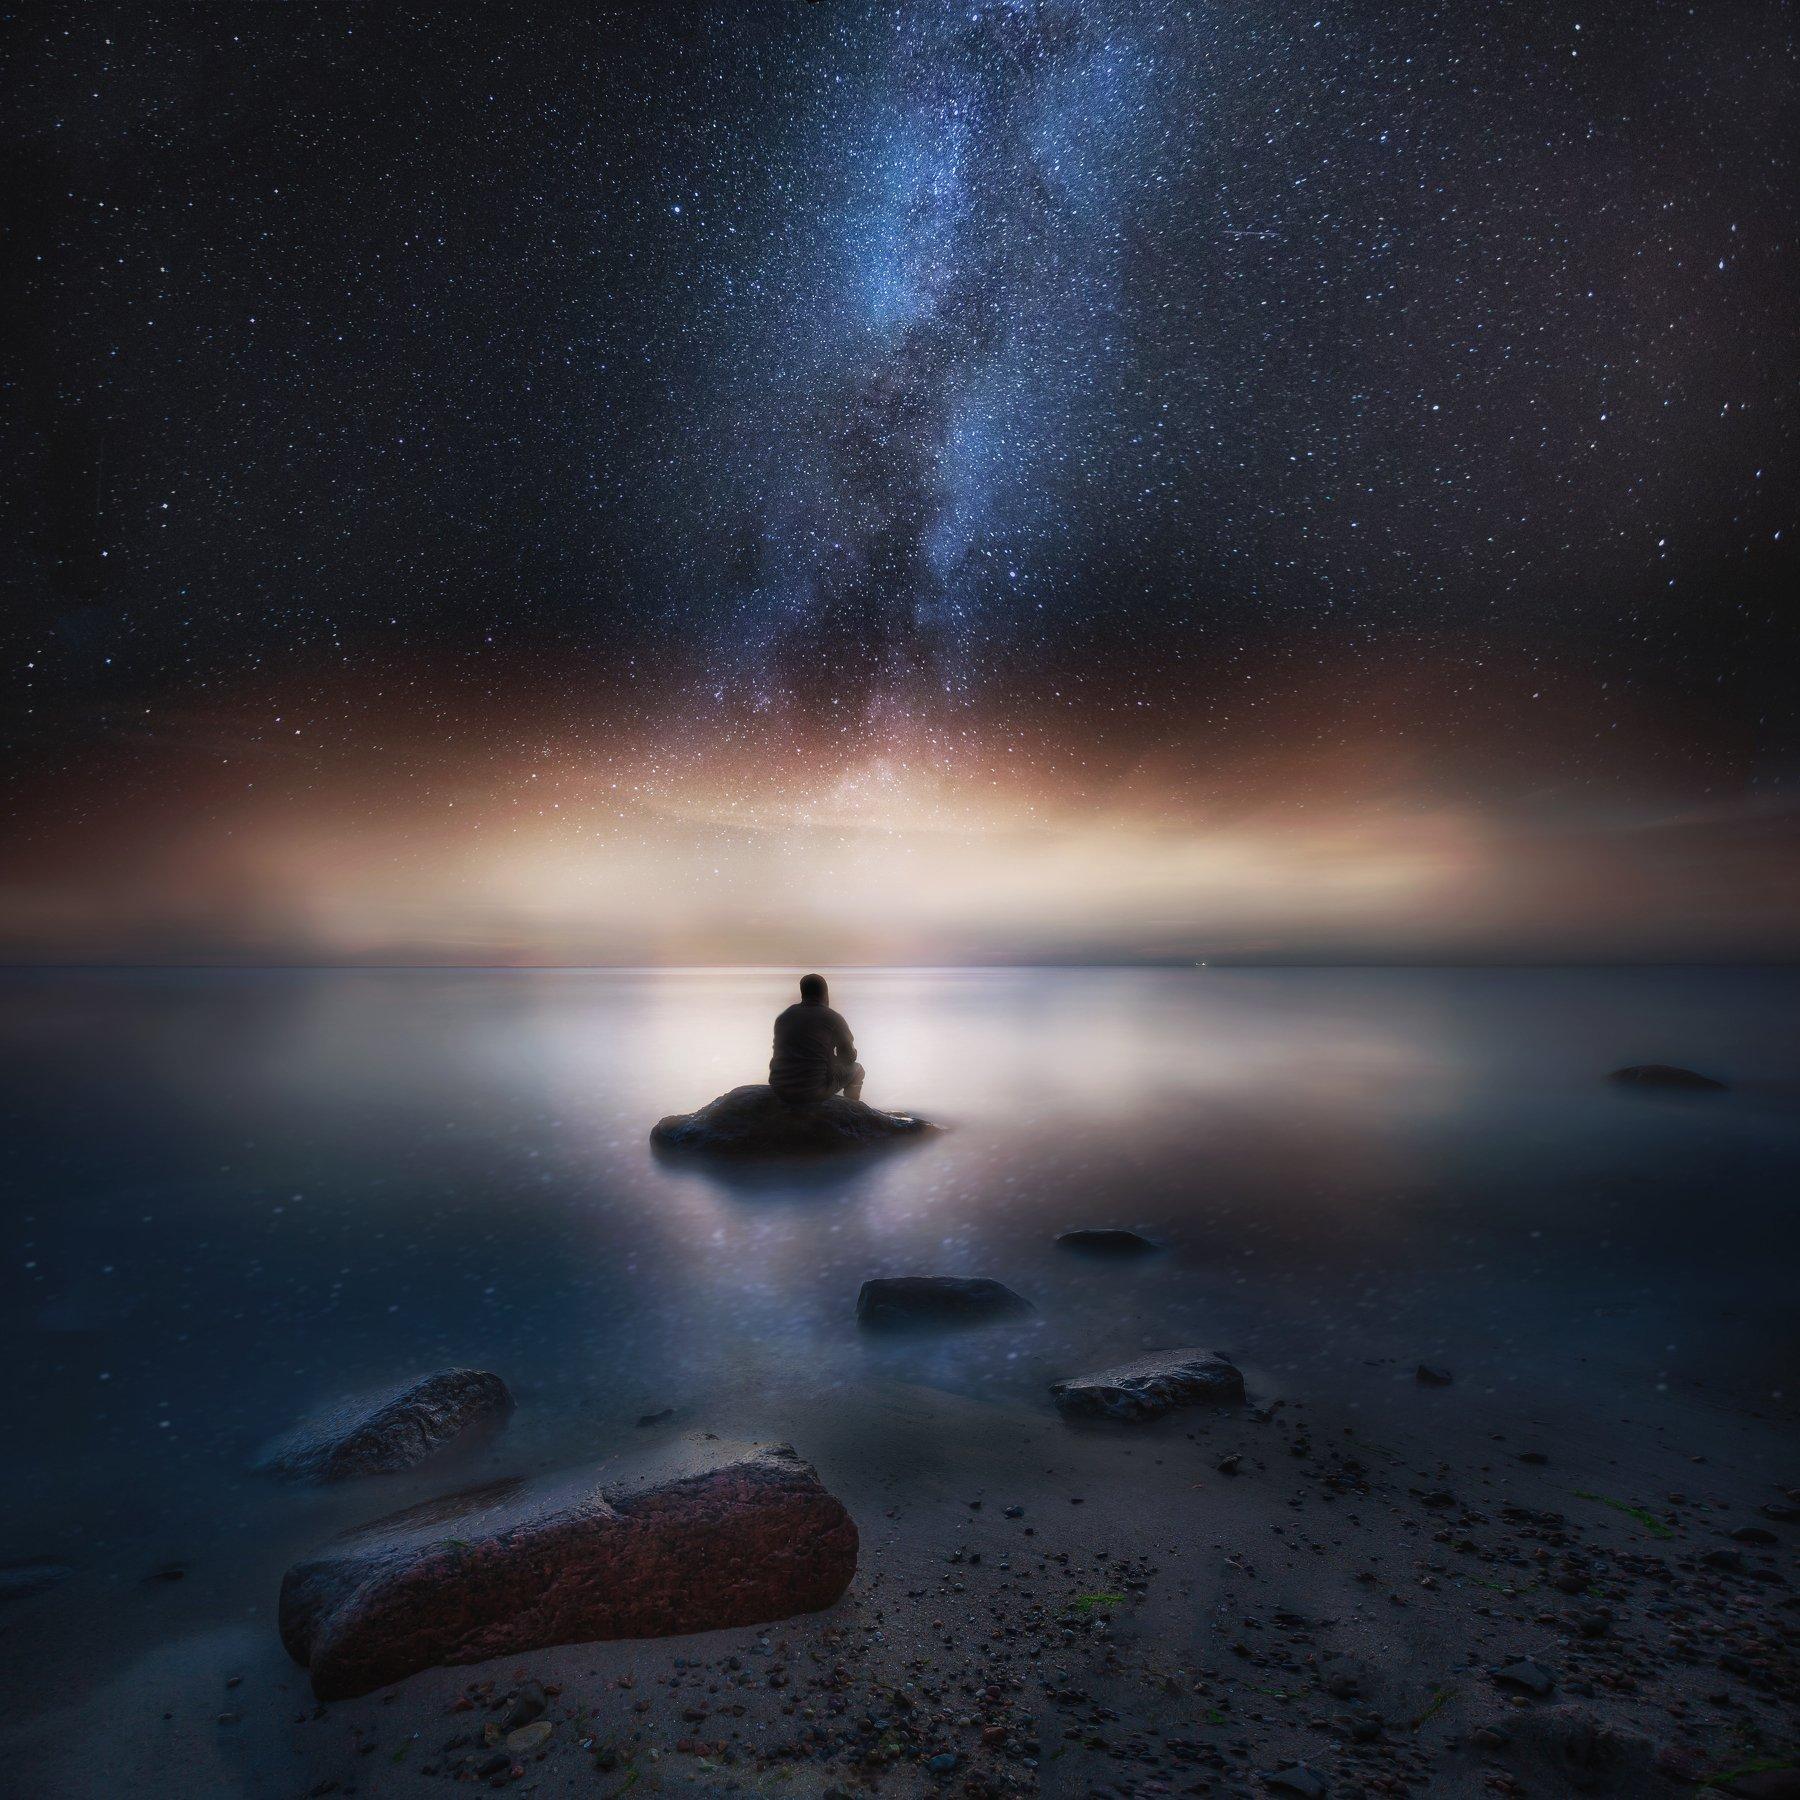 sea, shore, night, photography, milky way, landscape, man, silhouette, Milosz_G